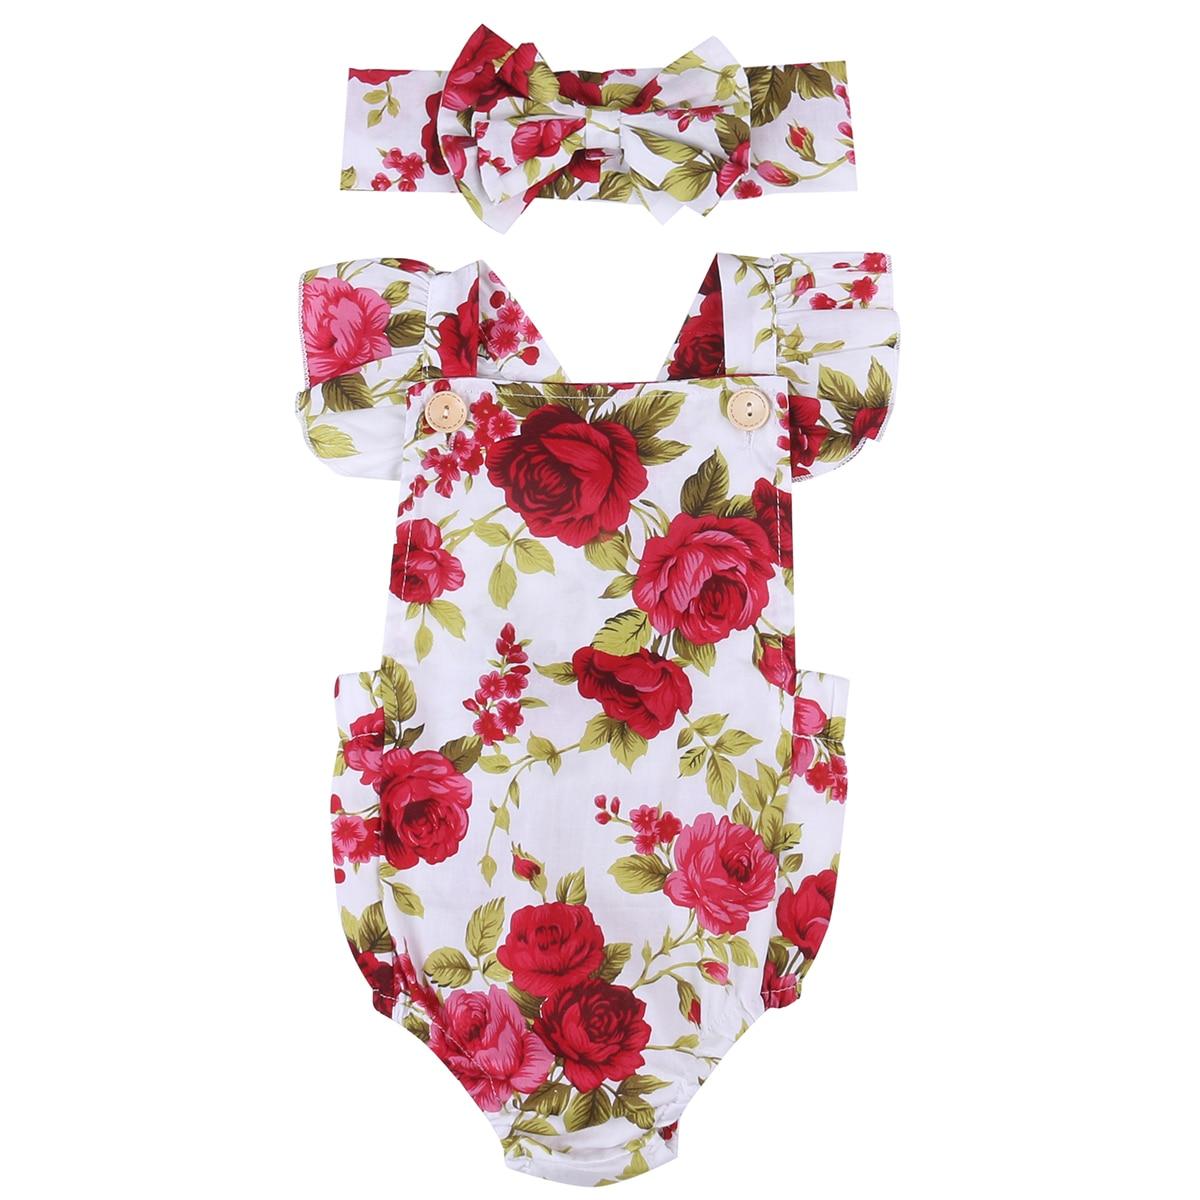 2017 Floral Baby Romper Newborn Baby Girl Clothes Ruffles Sleeve Bodysuit +Headband 2pcs Outfit Bebek Giyim Sunsuit 0-24M